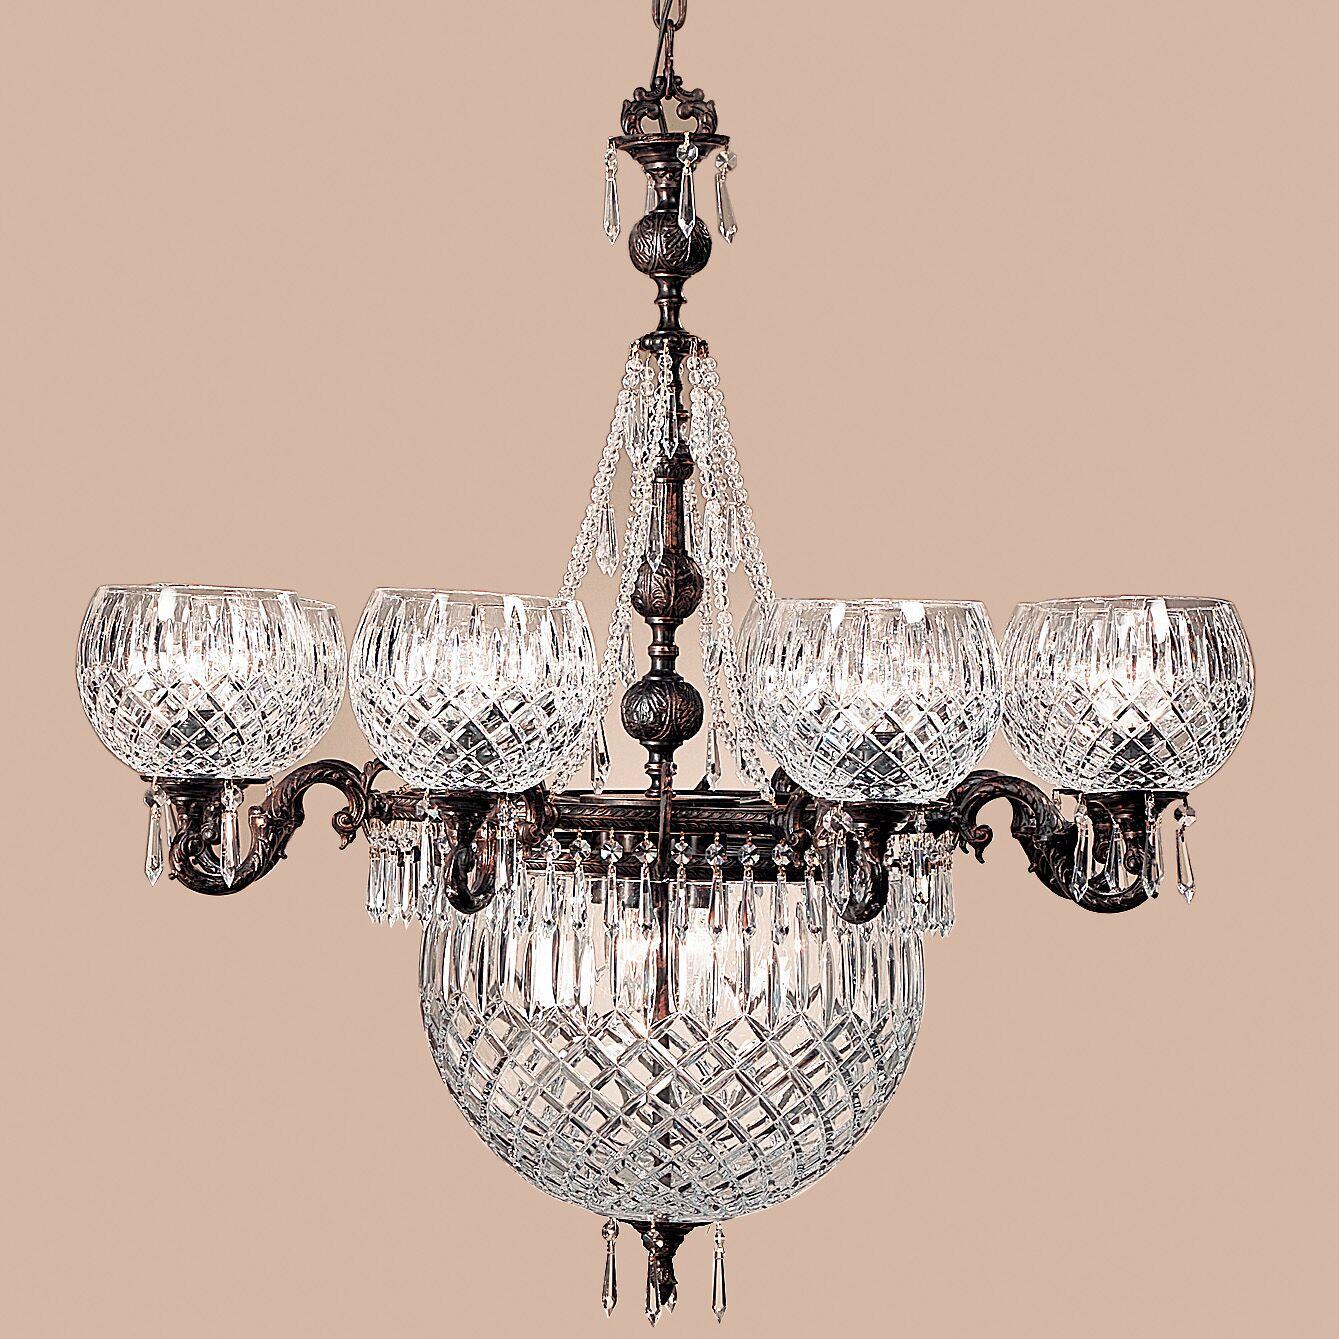 Waterbury 12-Light Shaded Chandelier Crystal Color: Crystalique Black